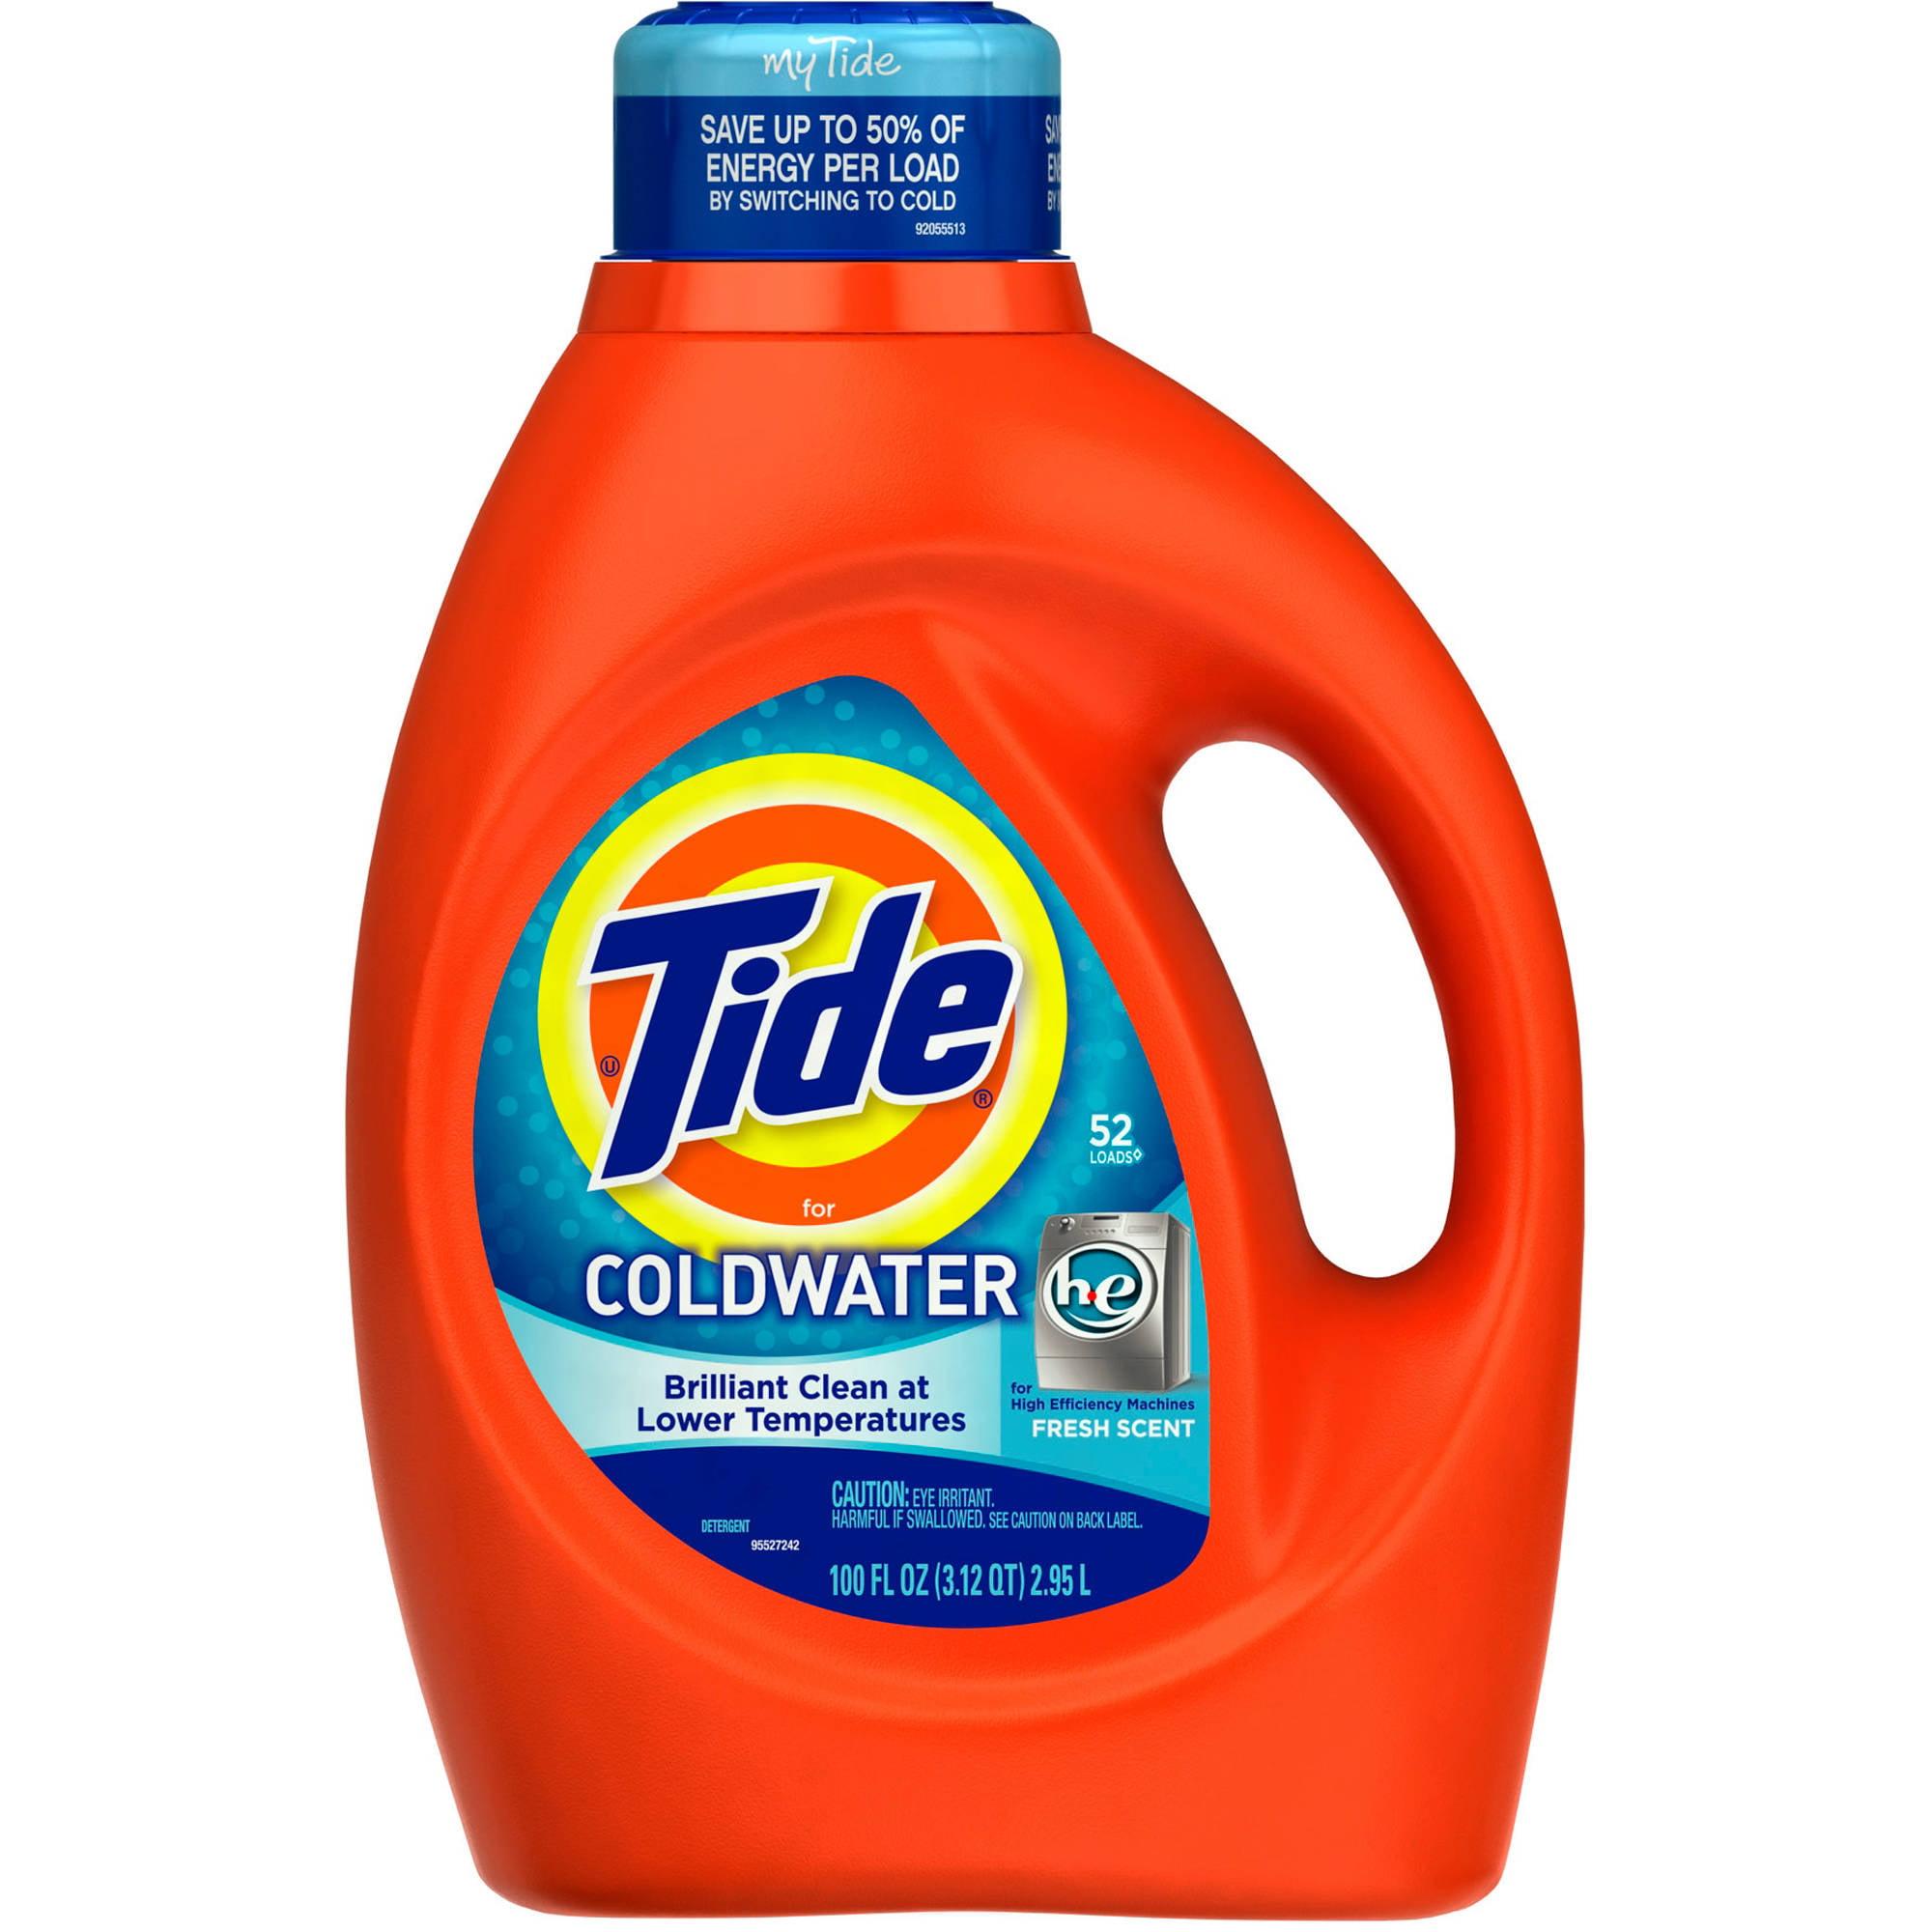 Tide Liquid Detergent, Coldwater For HE Machines, Fresh Scent, 52 Loads 100 fl oz